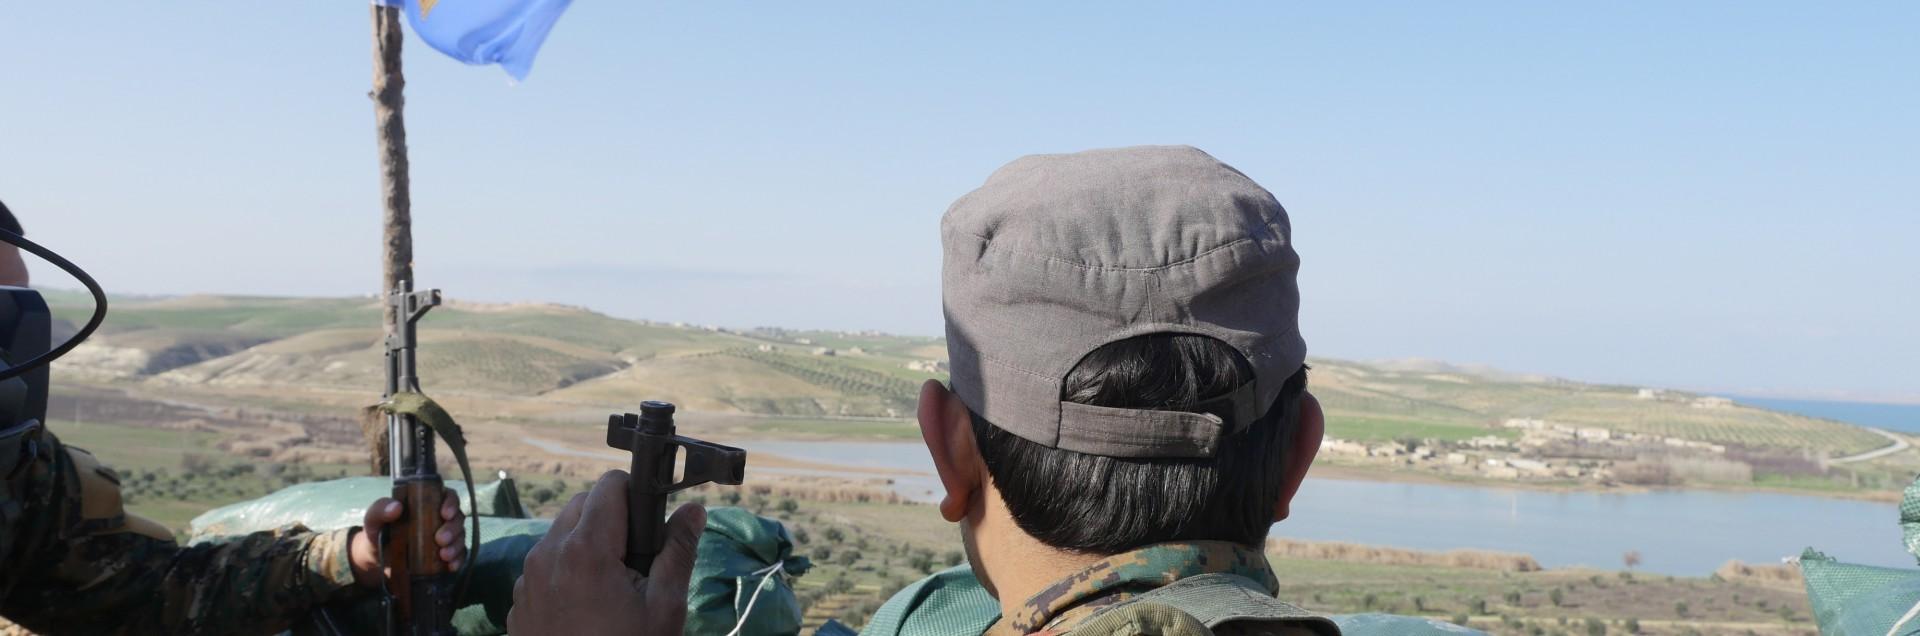 "Erdogan sul piede di guerra: ""Schiera i soldati, ci attacca"""